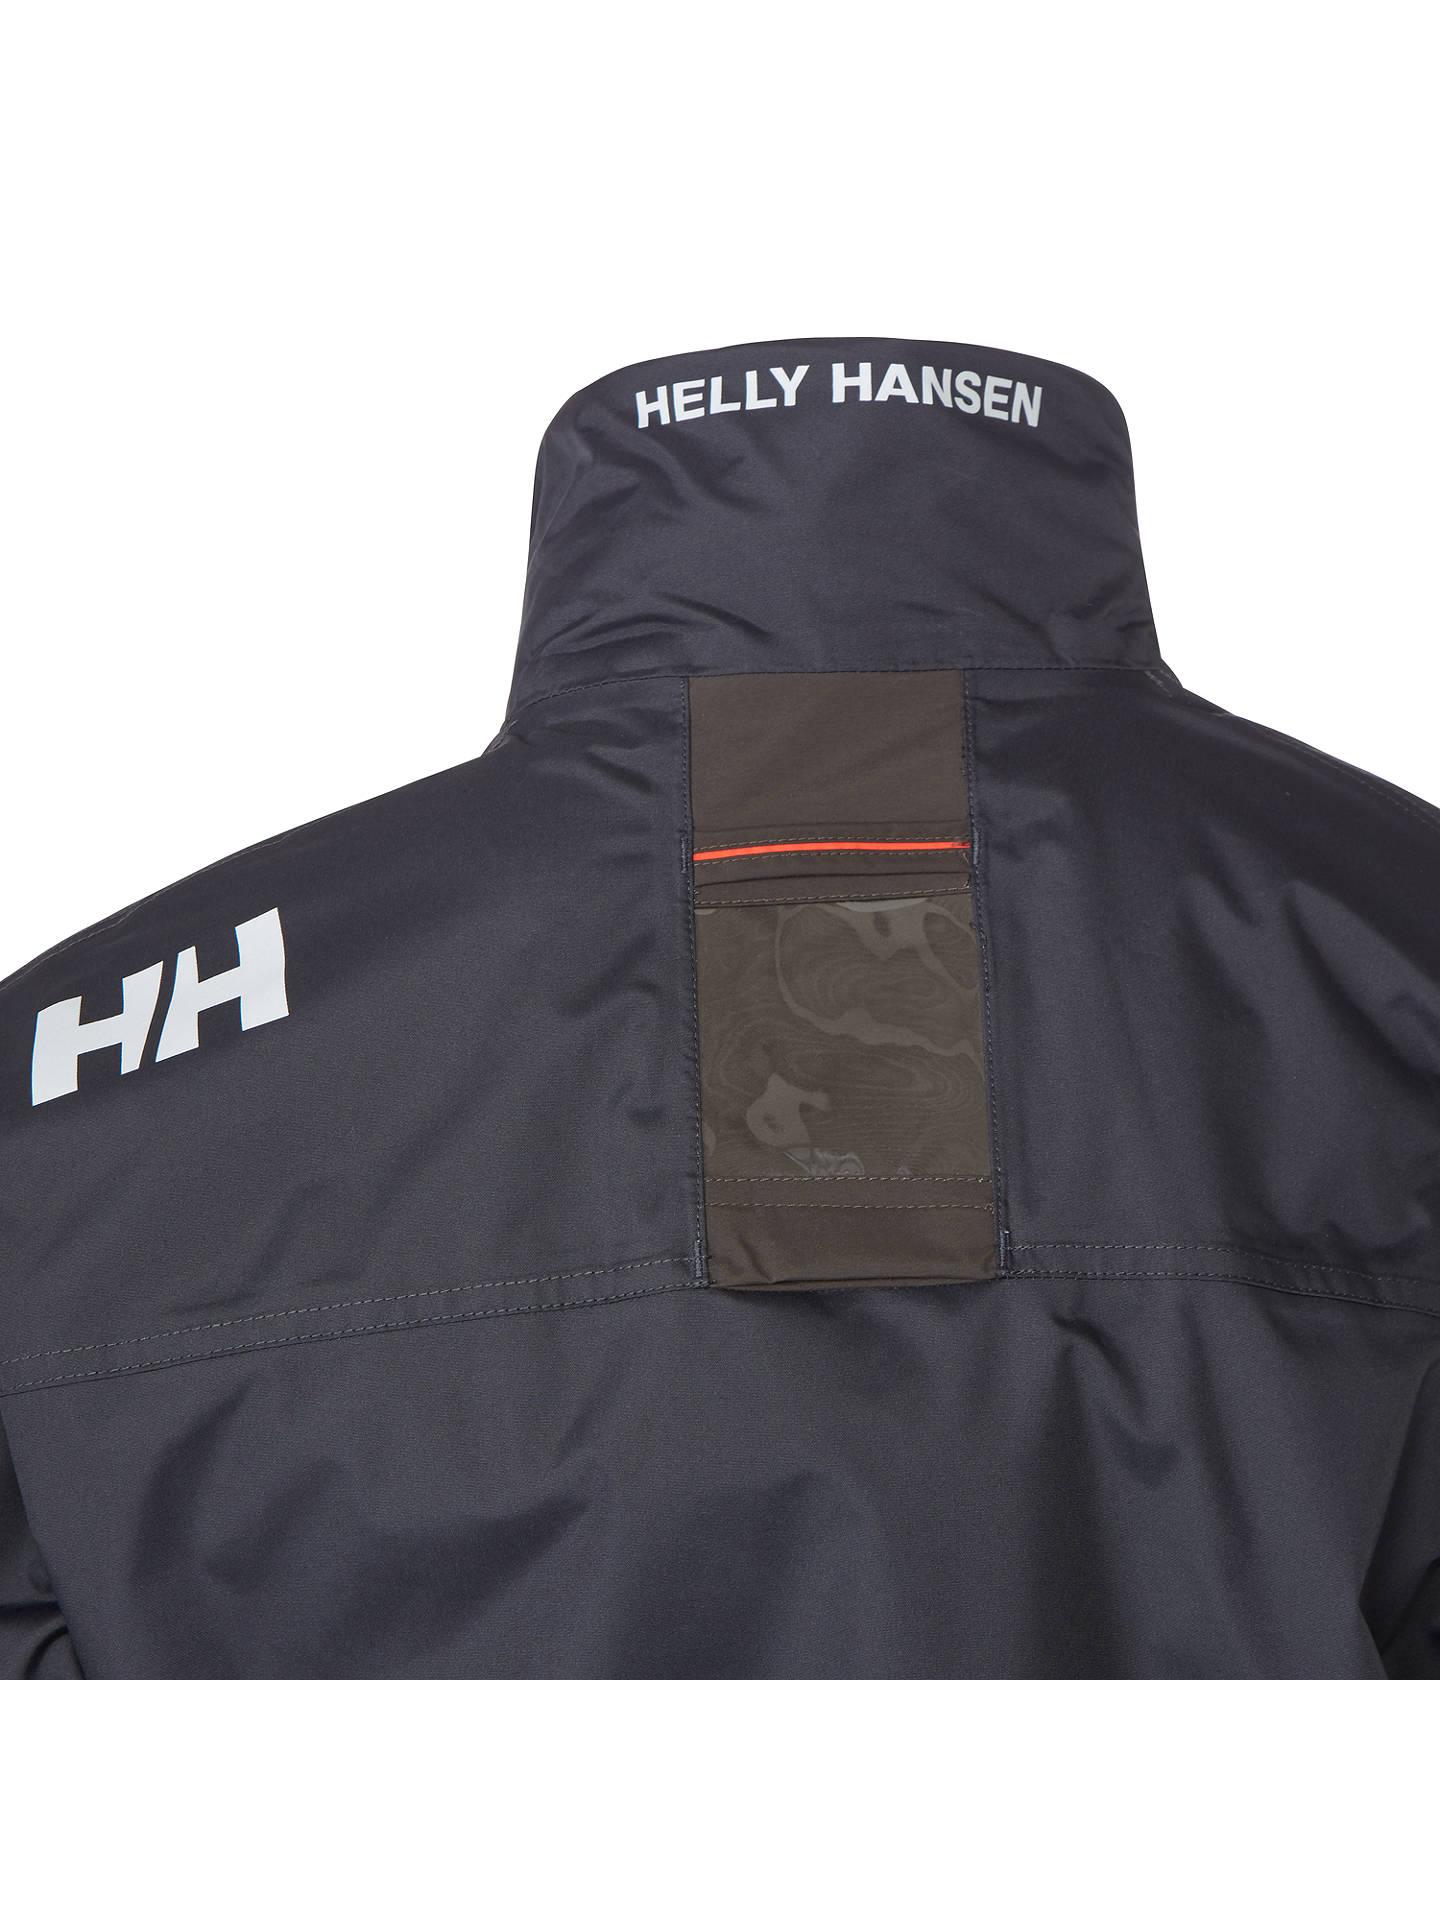 c91cead194711 ... BuyHelly Hansen Crew Midlayer Men s Jacket